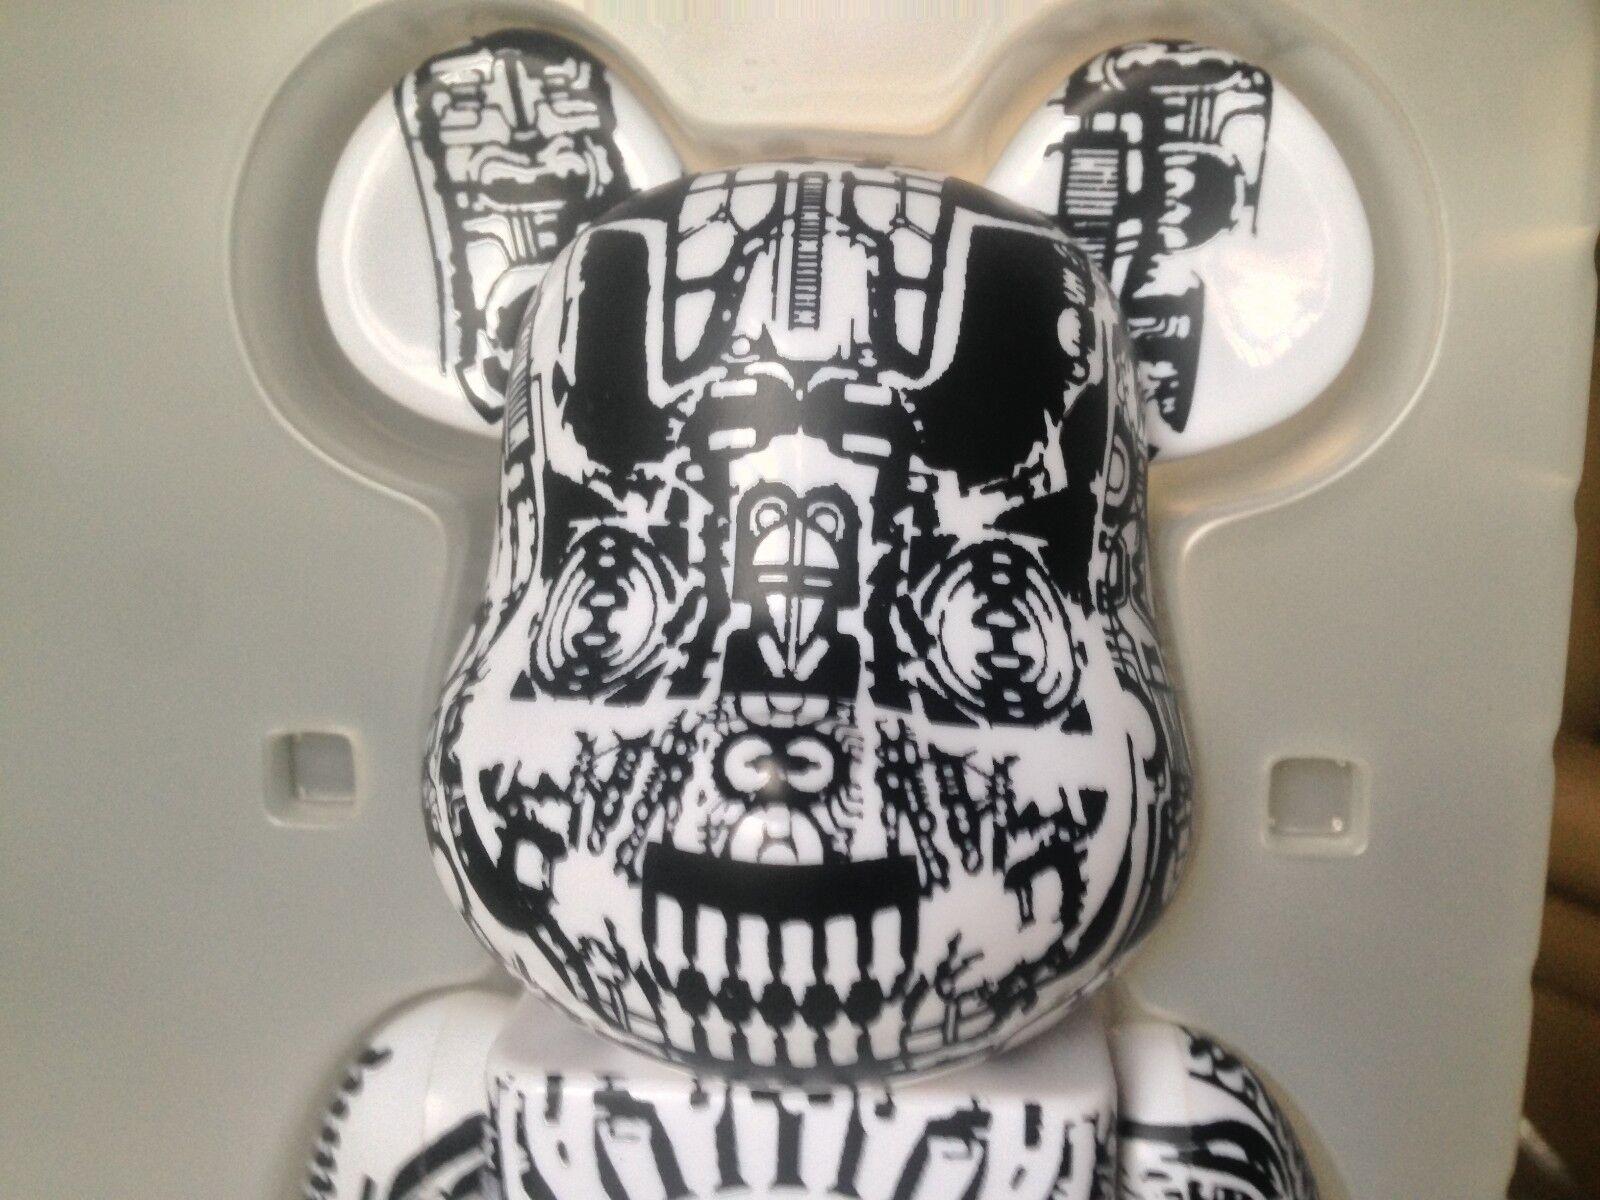 Be@rbrick H.R. Giger 400% bearbrick Kaws Kaws Alien Supreme bape